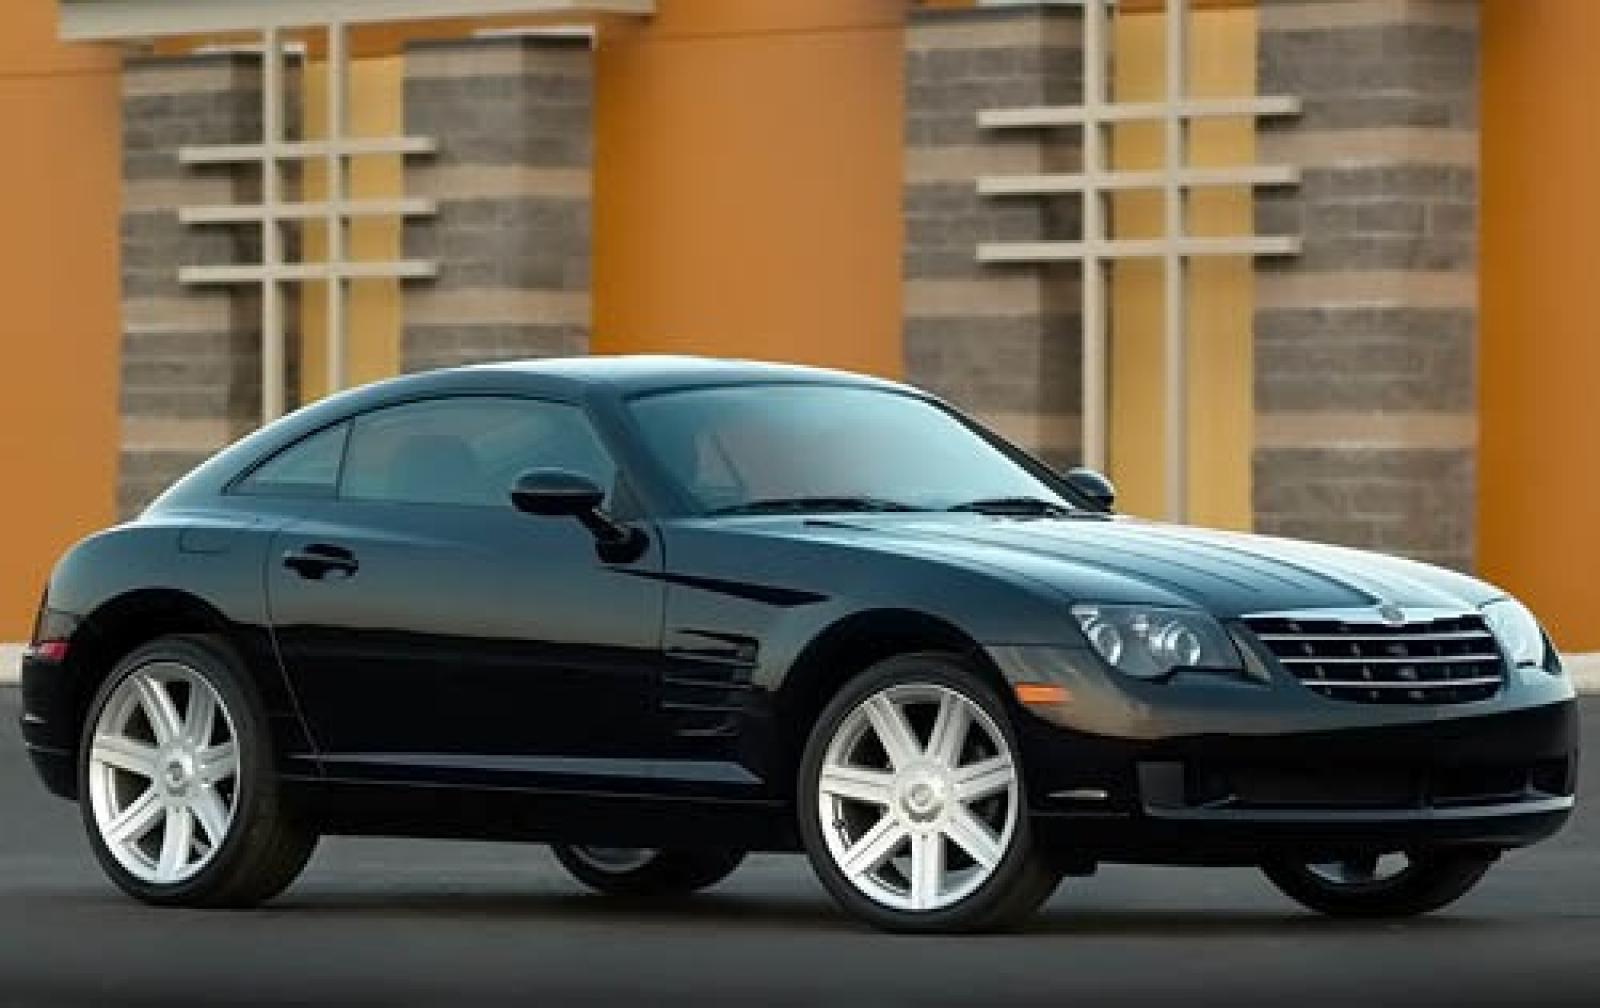 Chrysler crossfire reviews research new used models - 800 1024 1280 1600 Origin 2008 Chrysler Crossfire